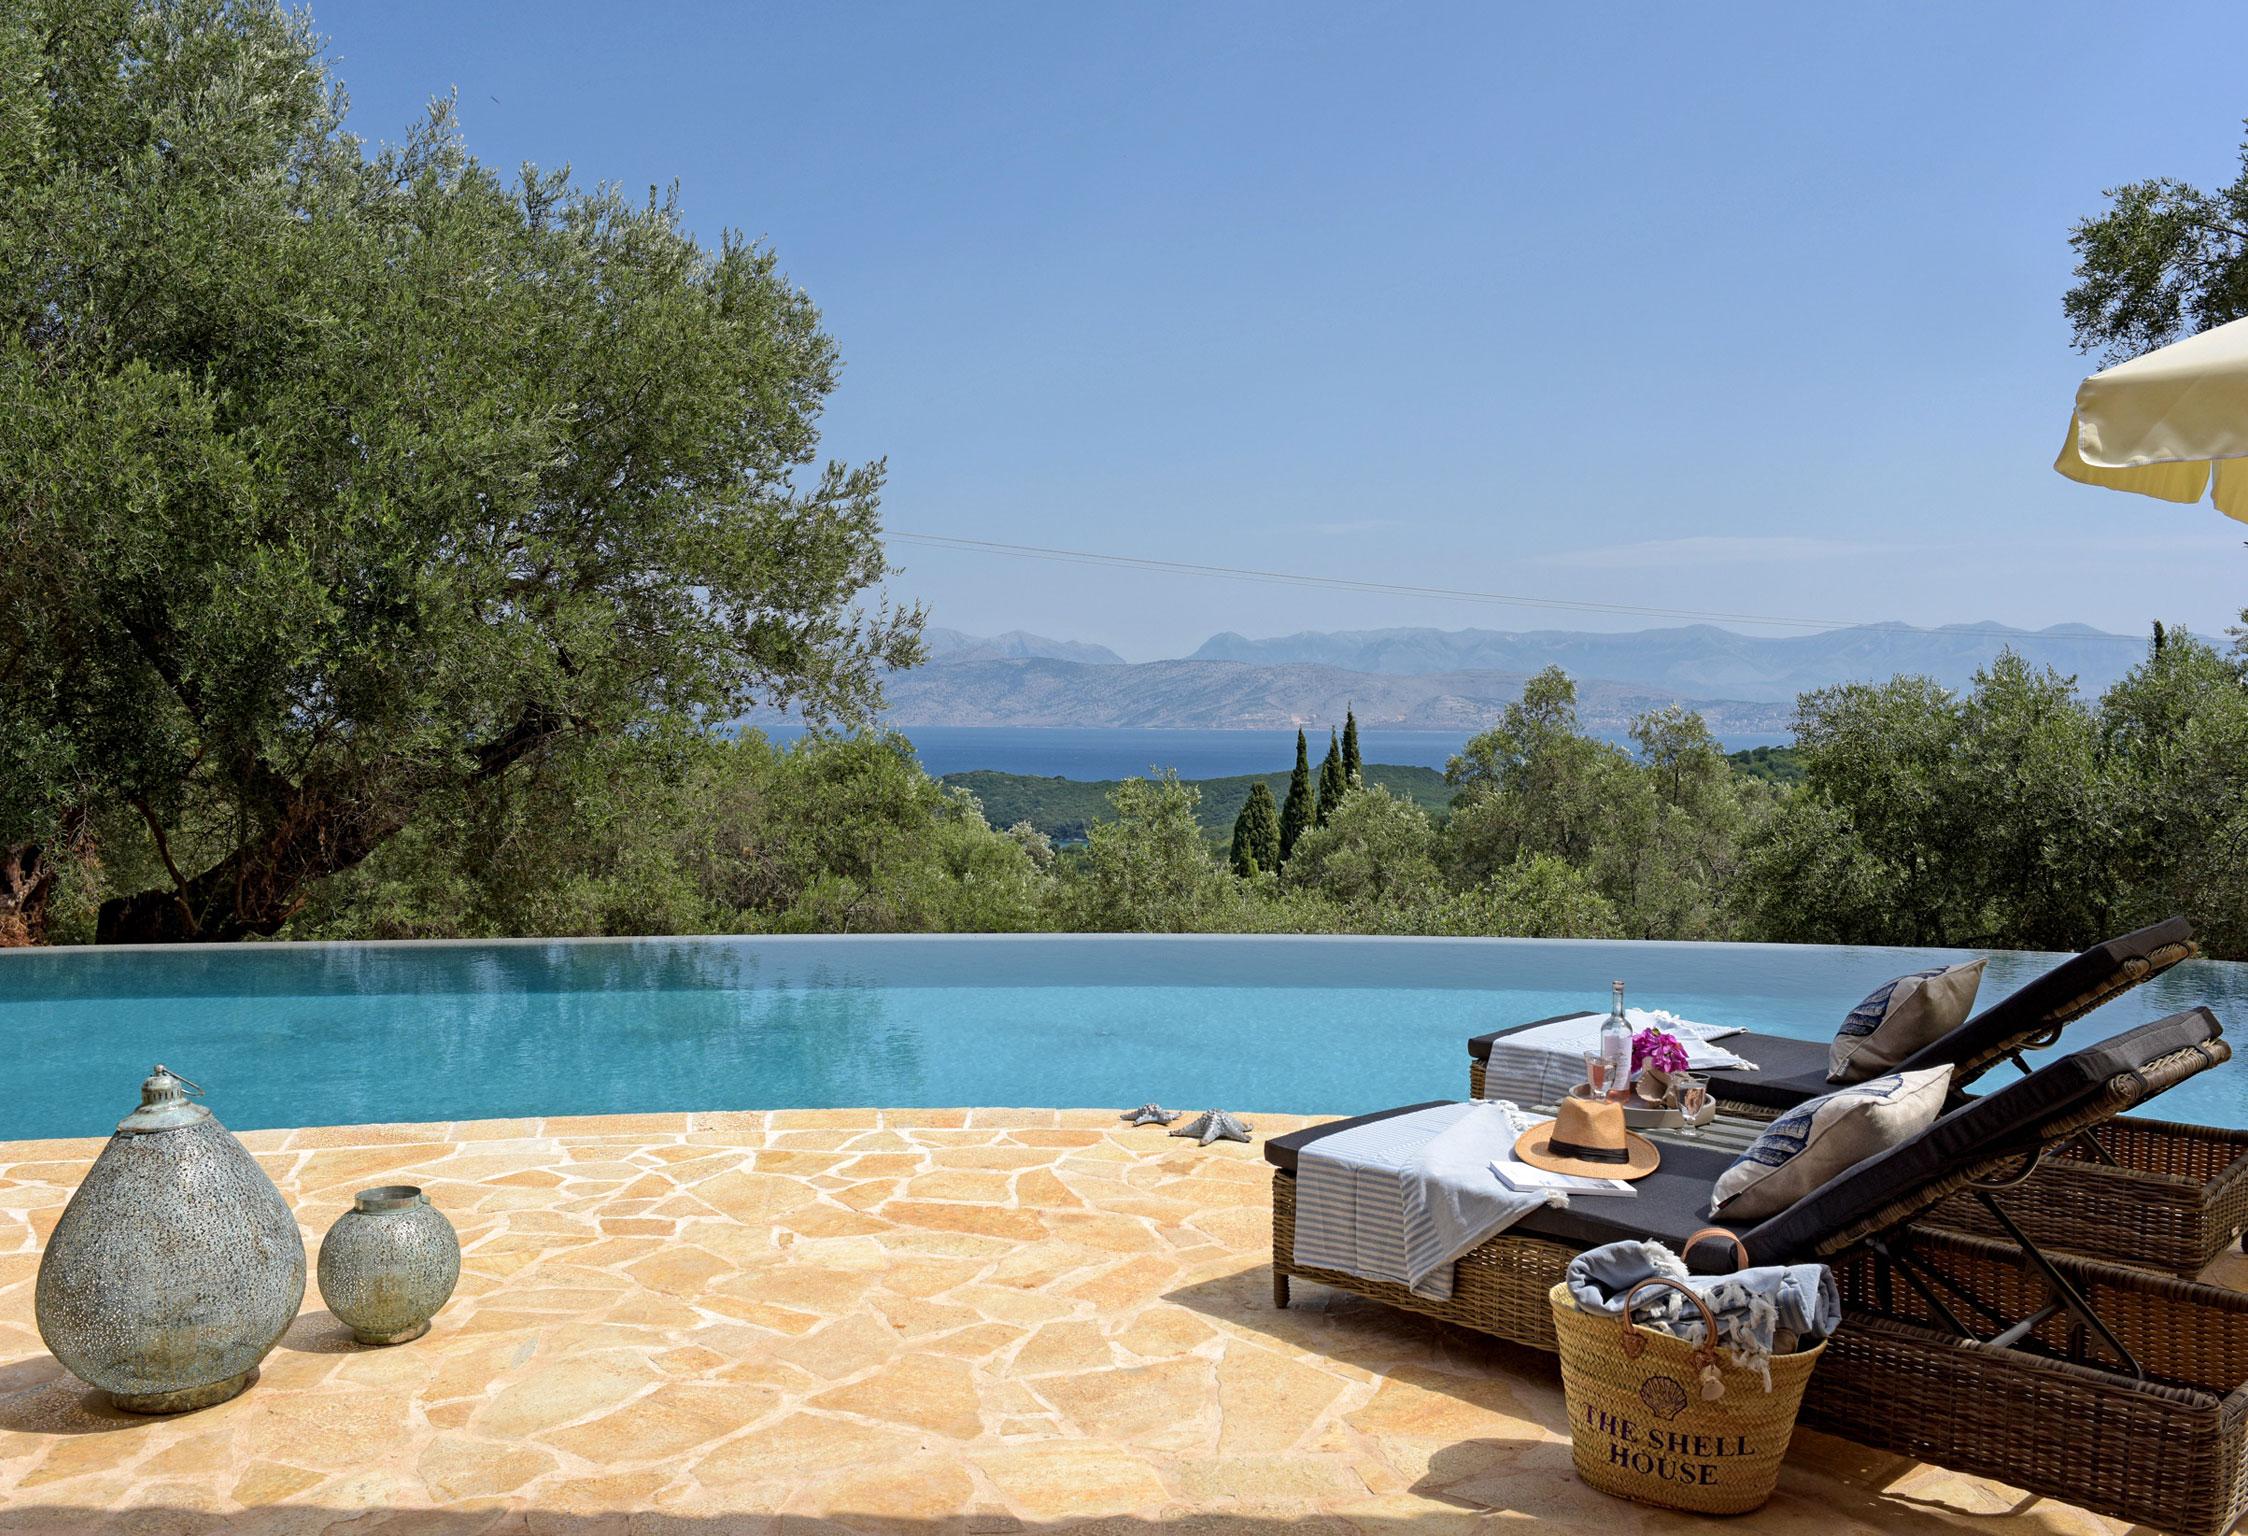 Corfu Villa Cinnamon jumbotron image